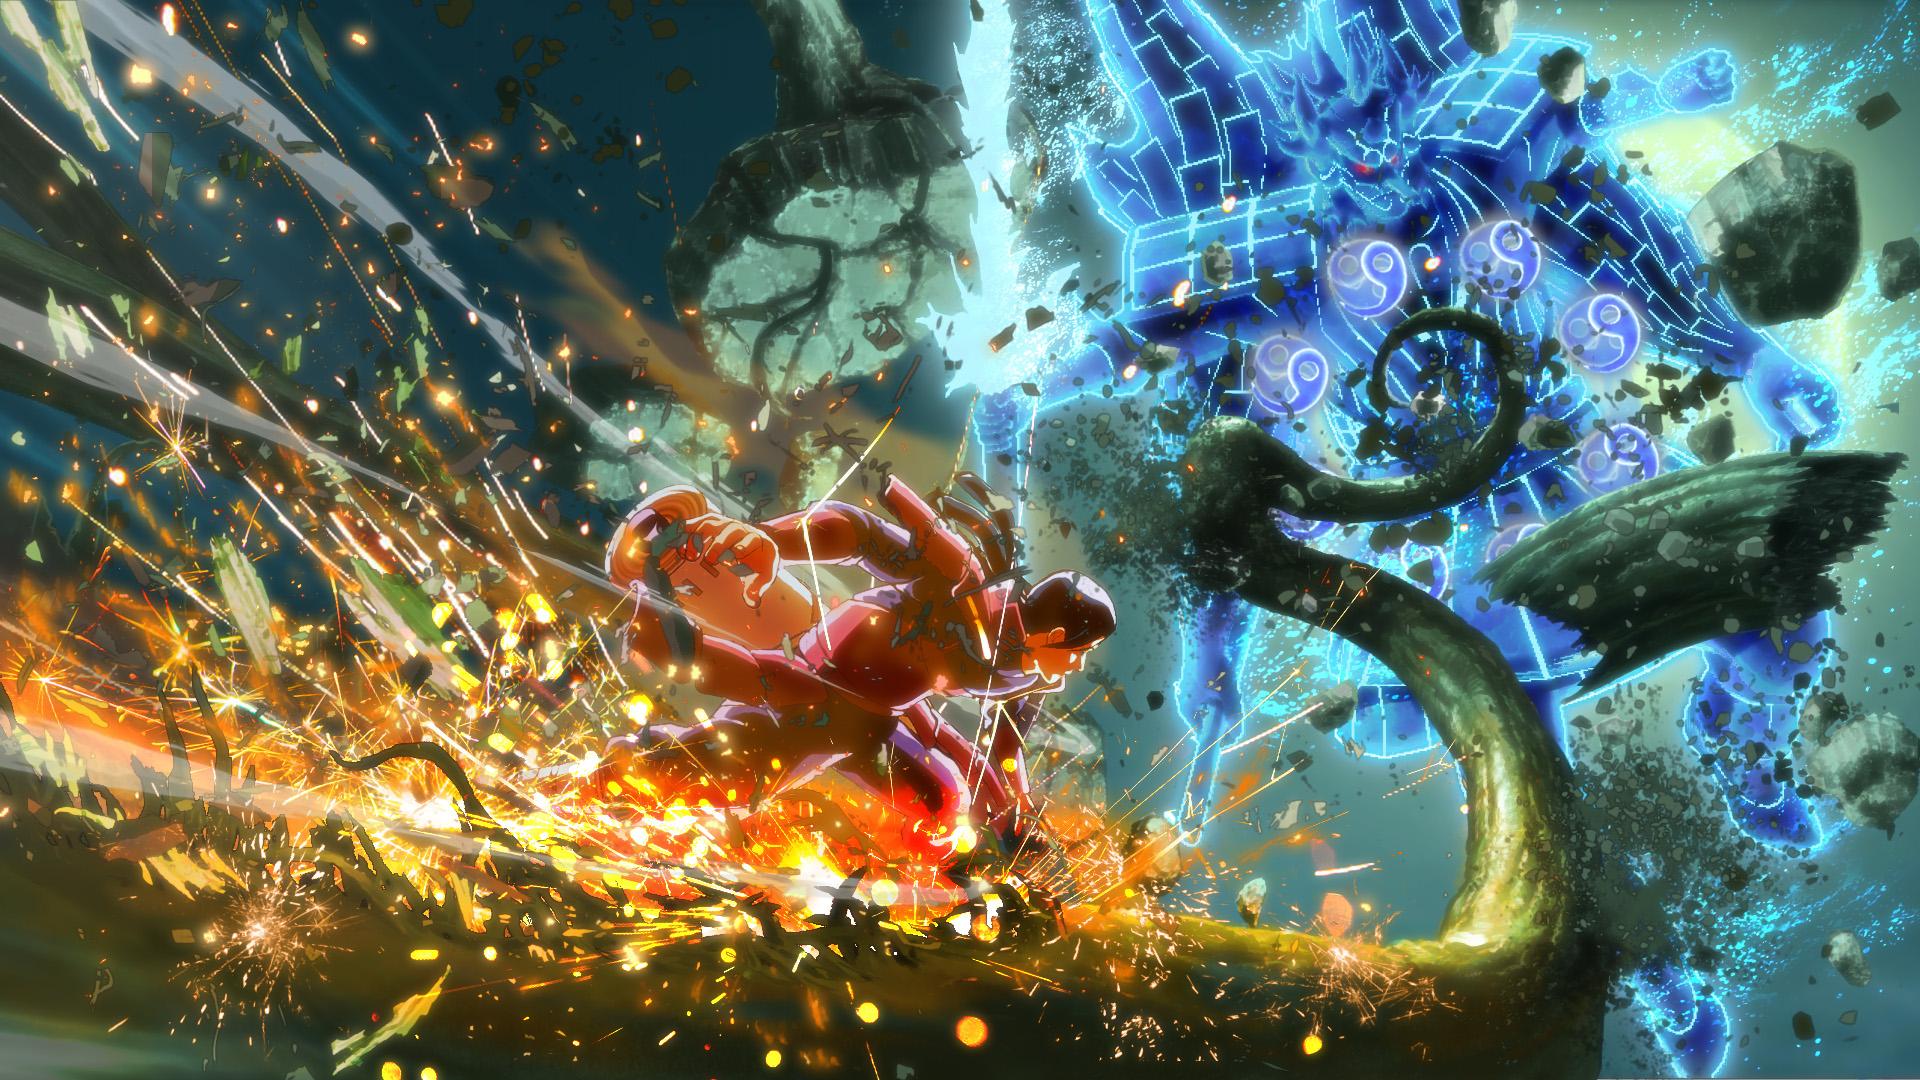 Naruto Shippuden: Ultimate Ninja Storm 4 First Hokage Hashirama Senju fight screenshot